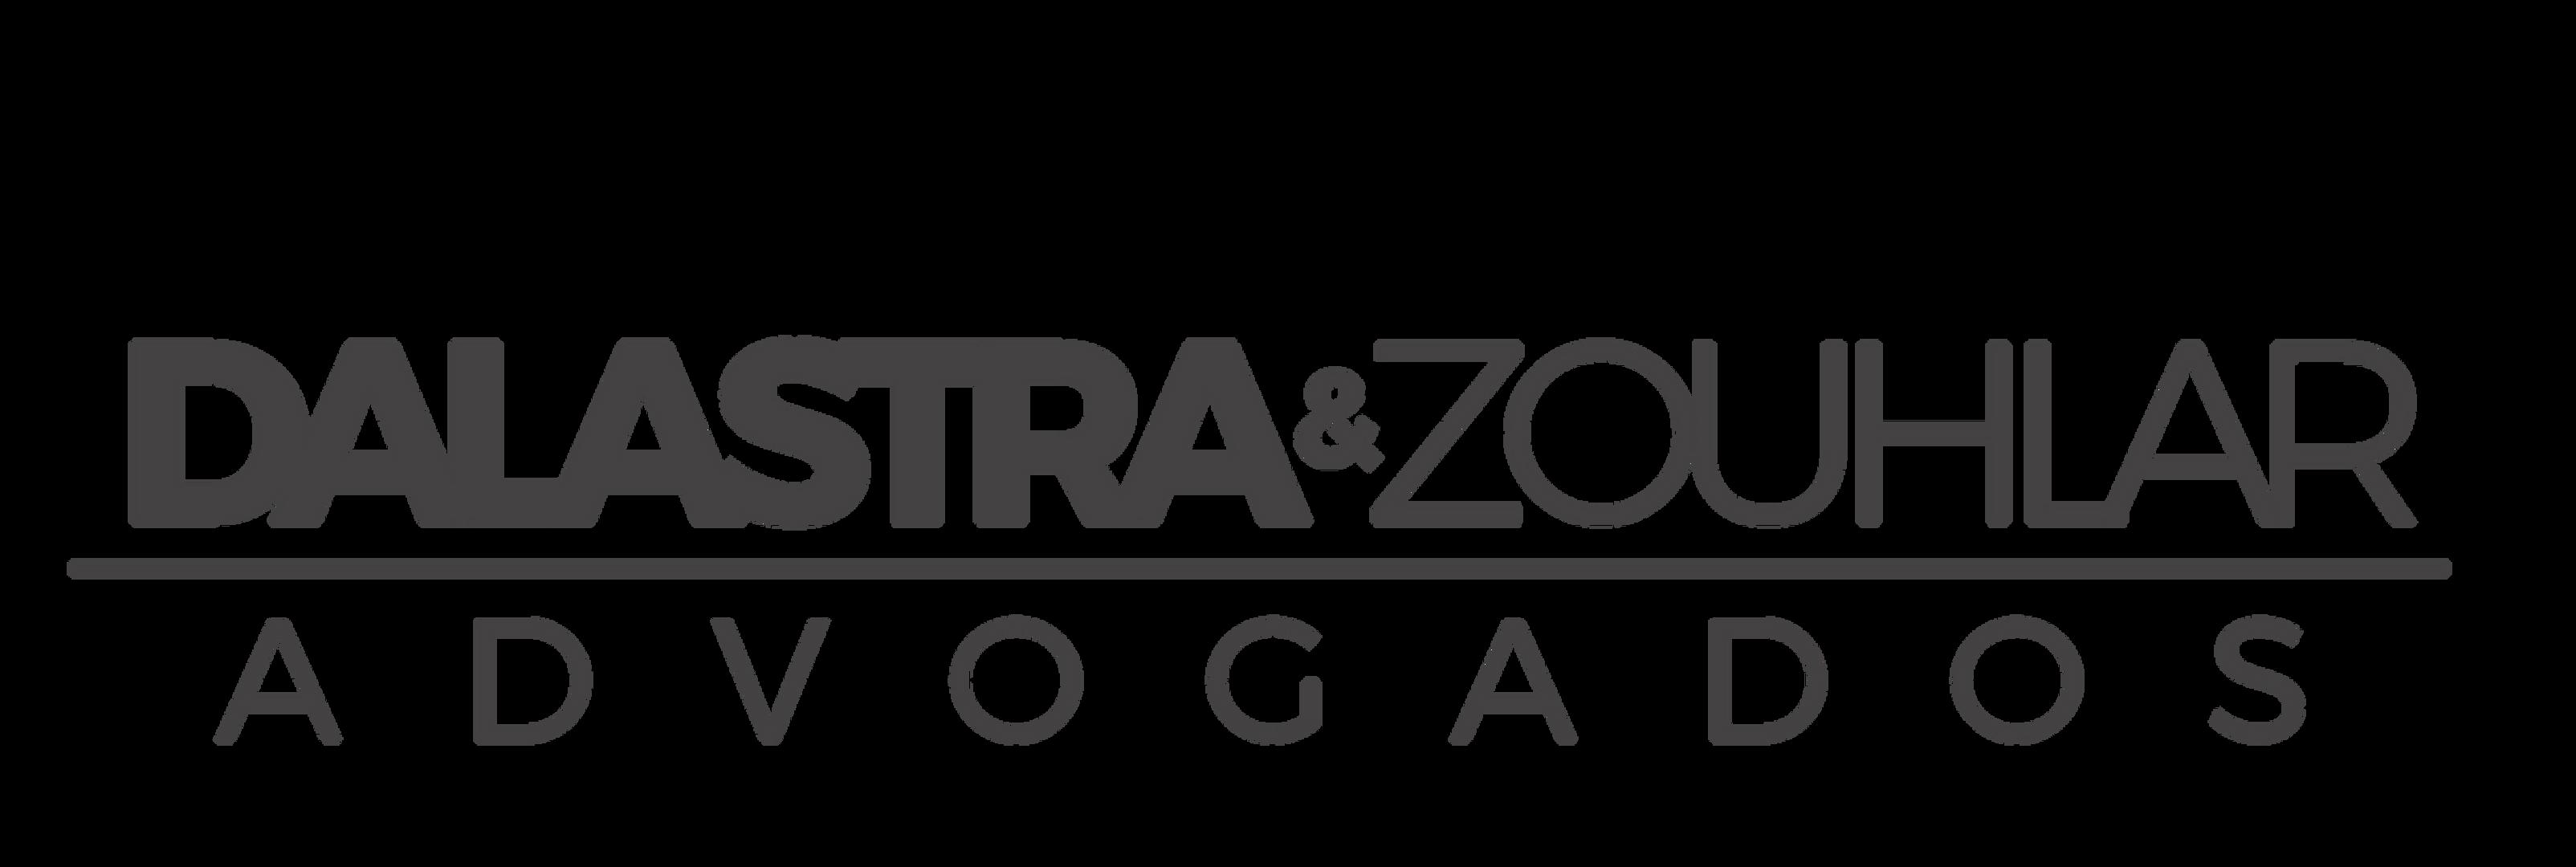 Dalastra & Zouhlar - Advogados